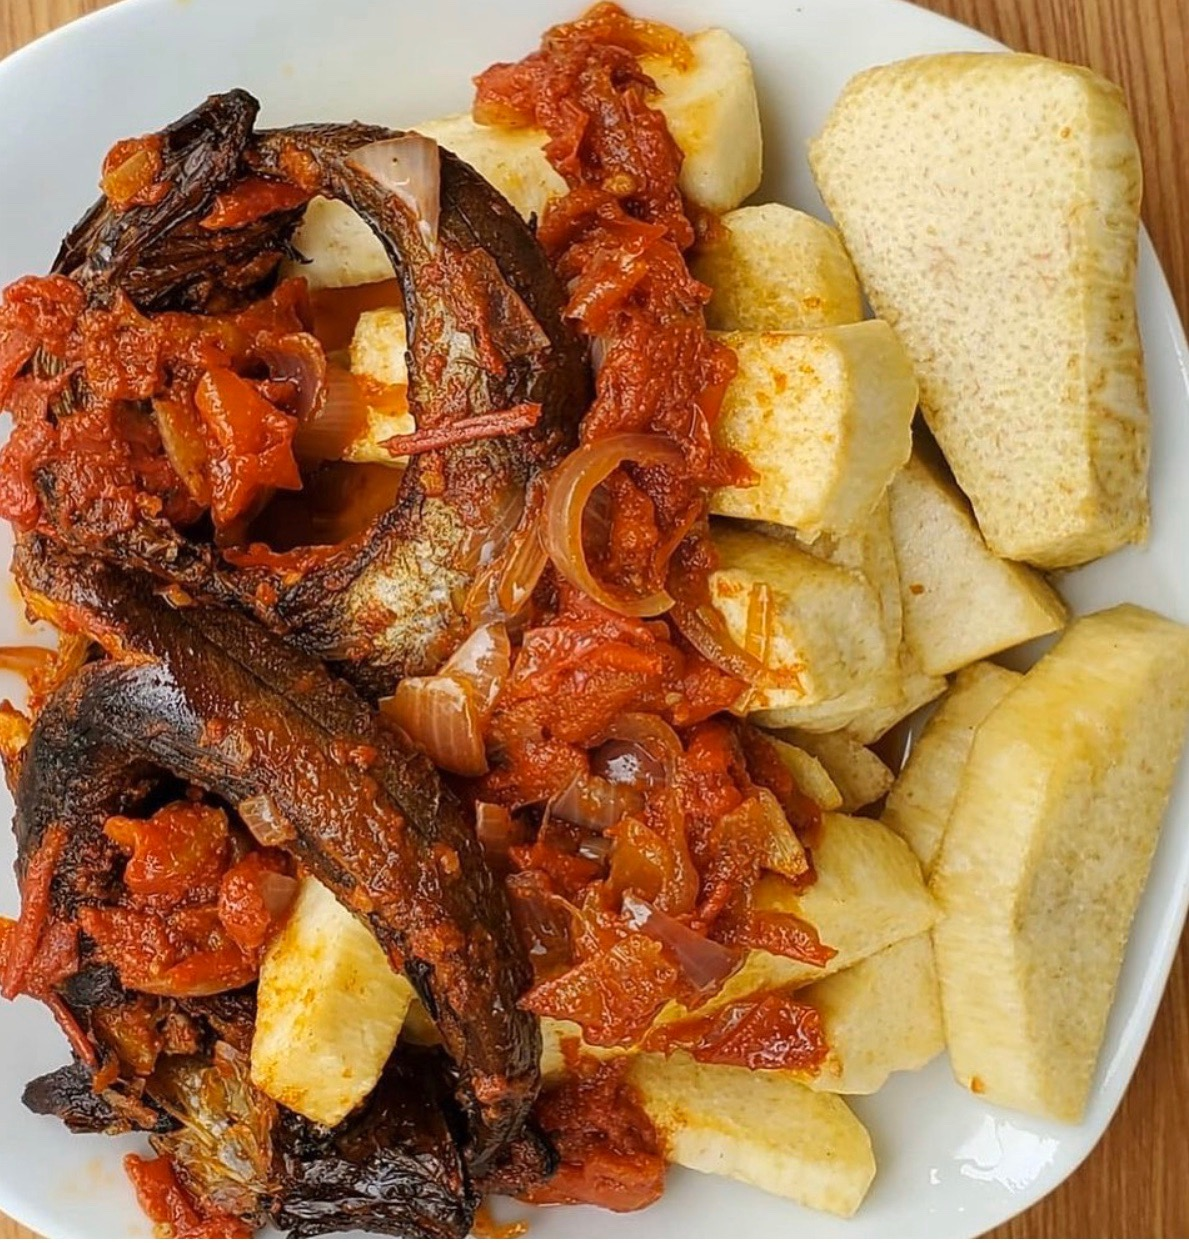 #cookingrecipehq   fried yam with panla sauce-  yam -smoked fish -fresh pepper  -onions- crayfish-  salt-  maggi-  curry  -tomatoes